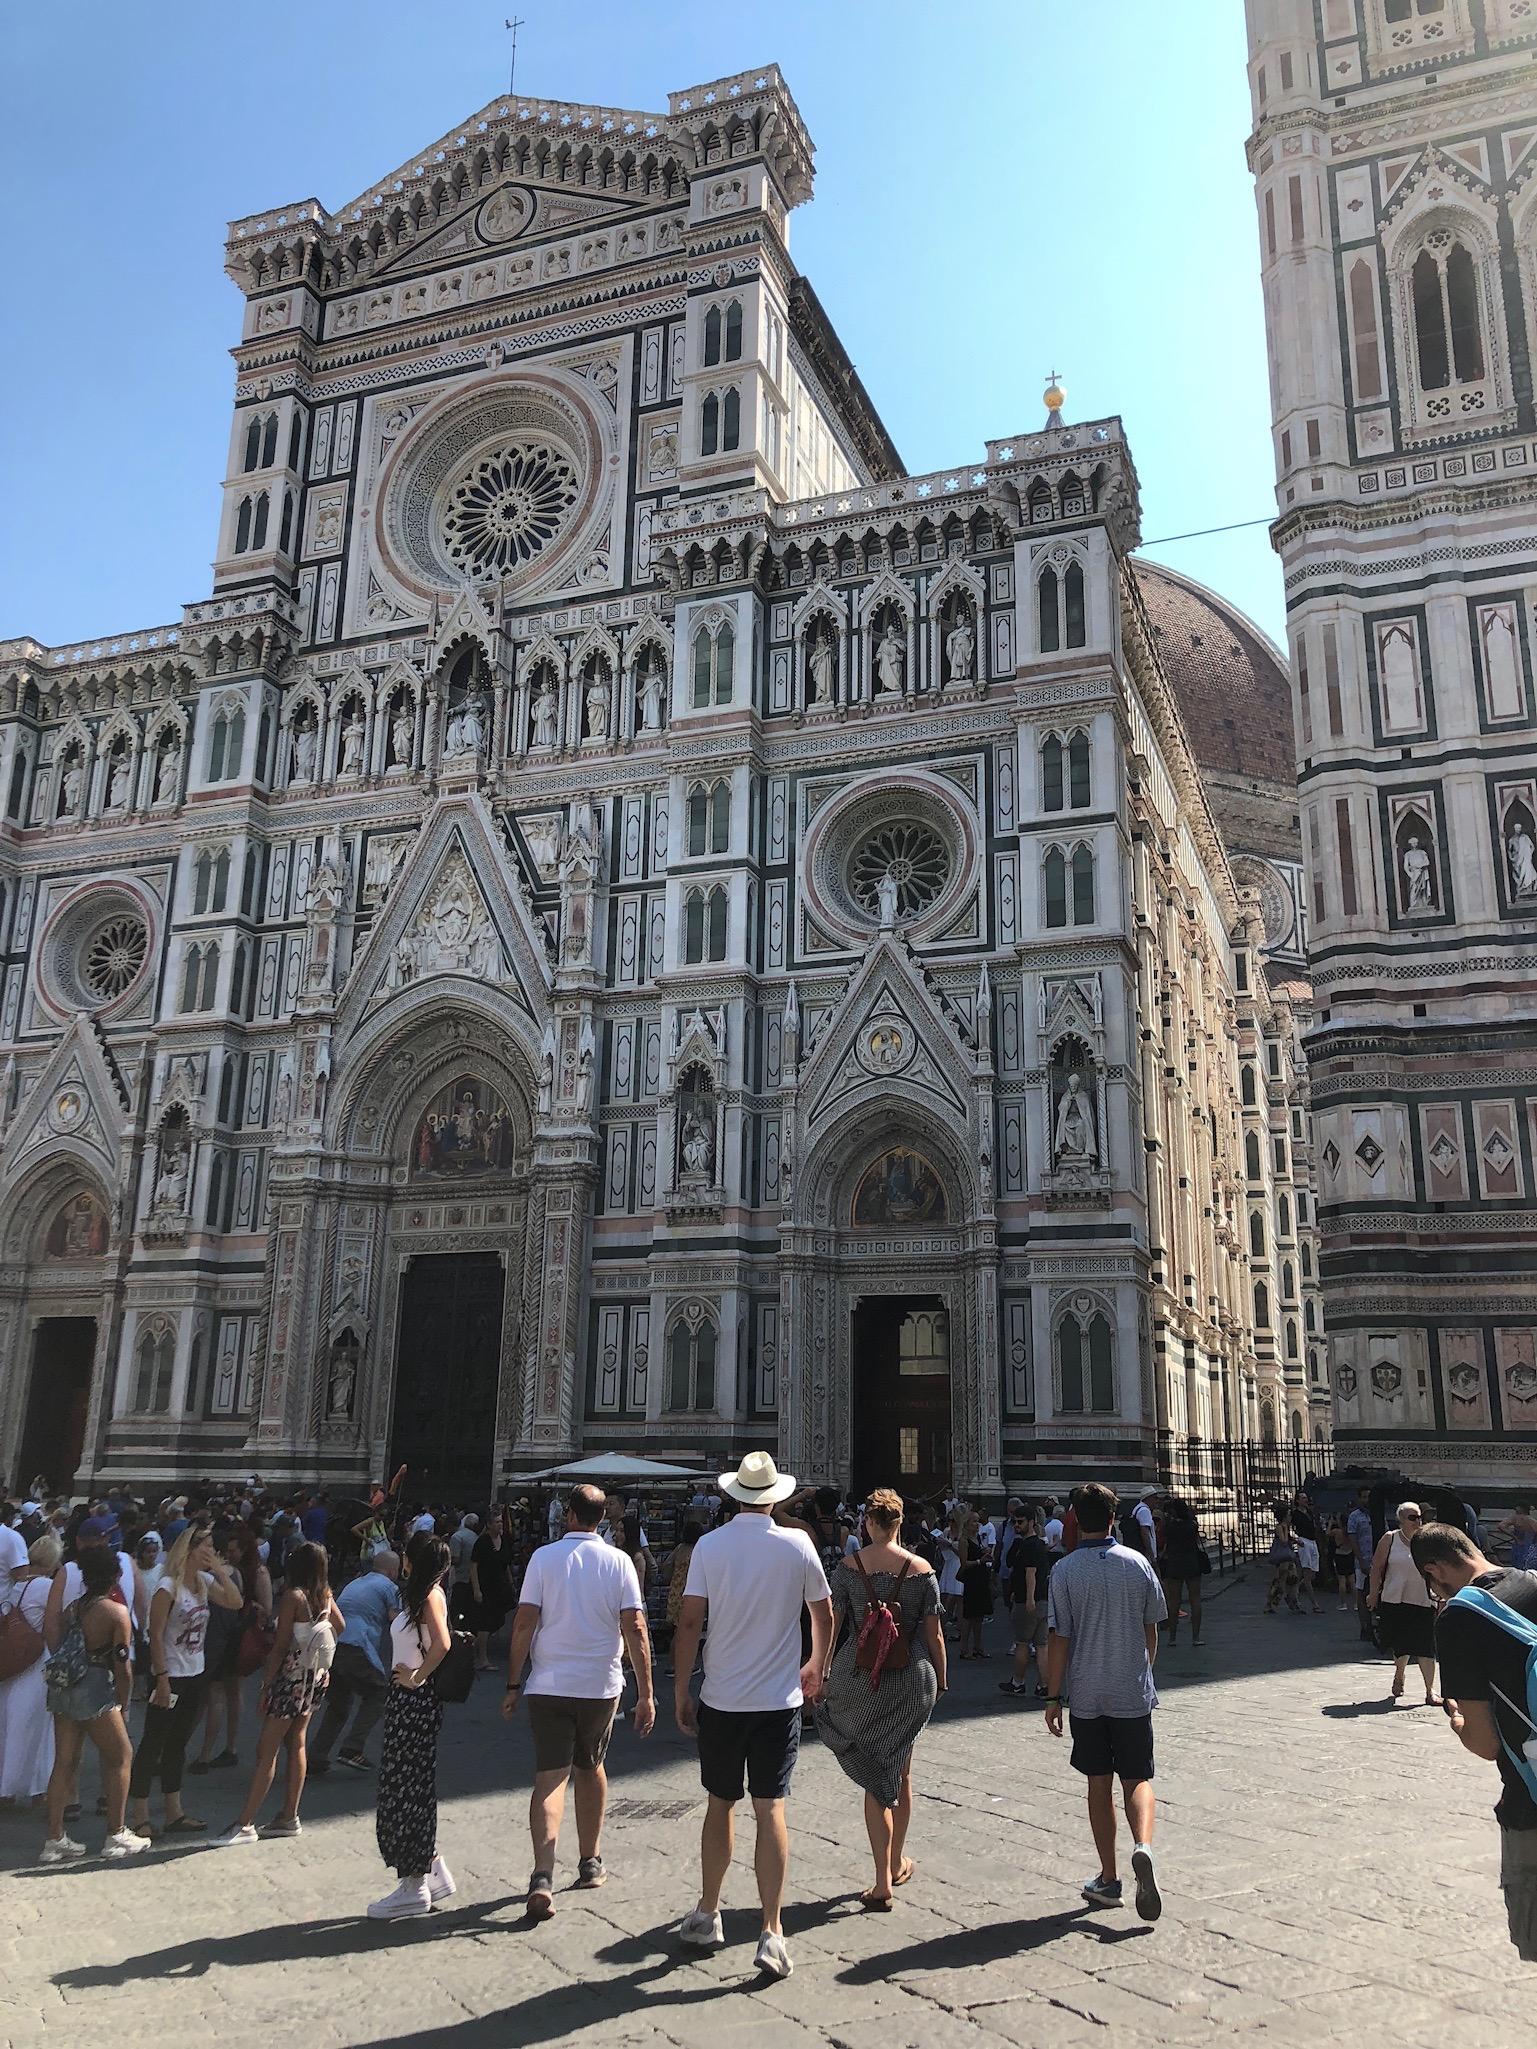 Duomo di Firenze, a central landmark in Florence.